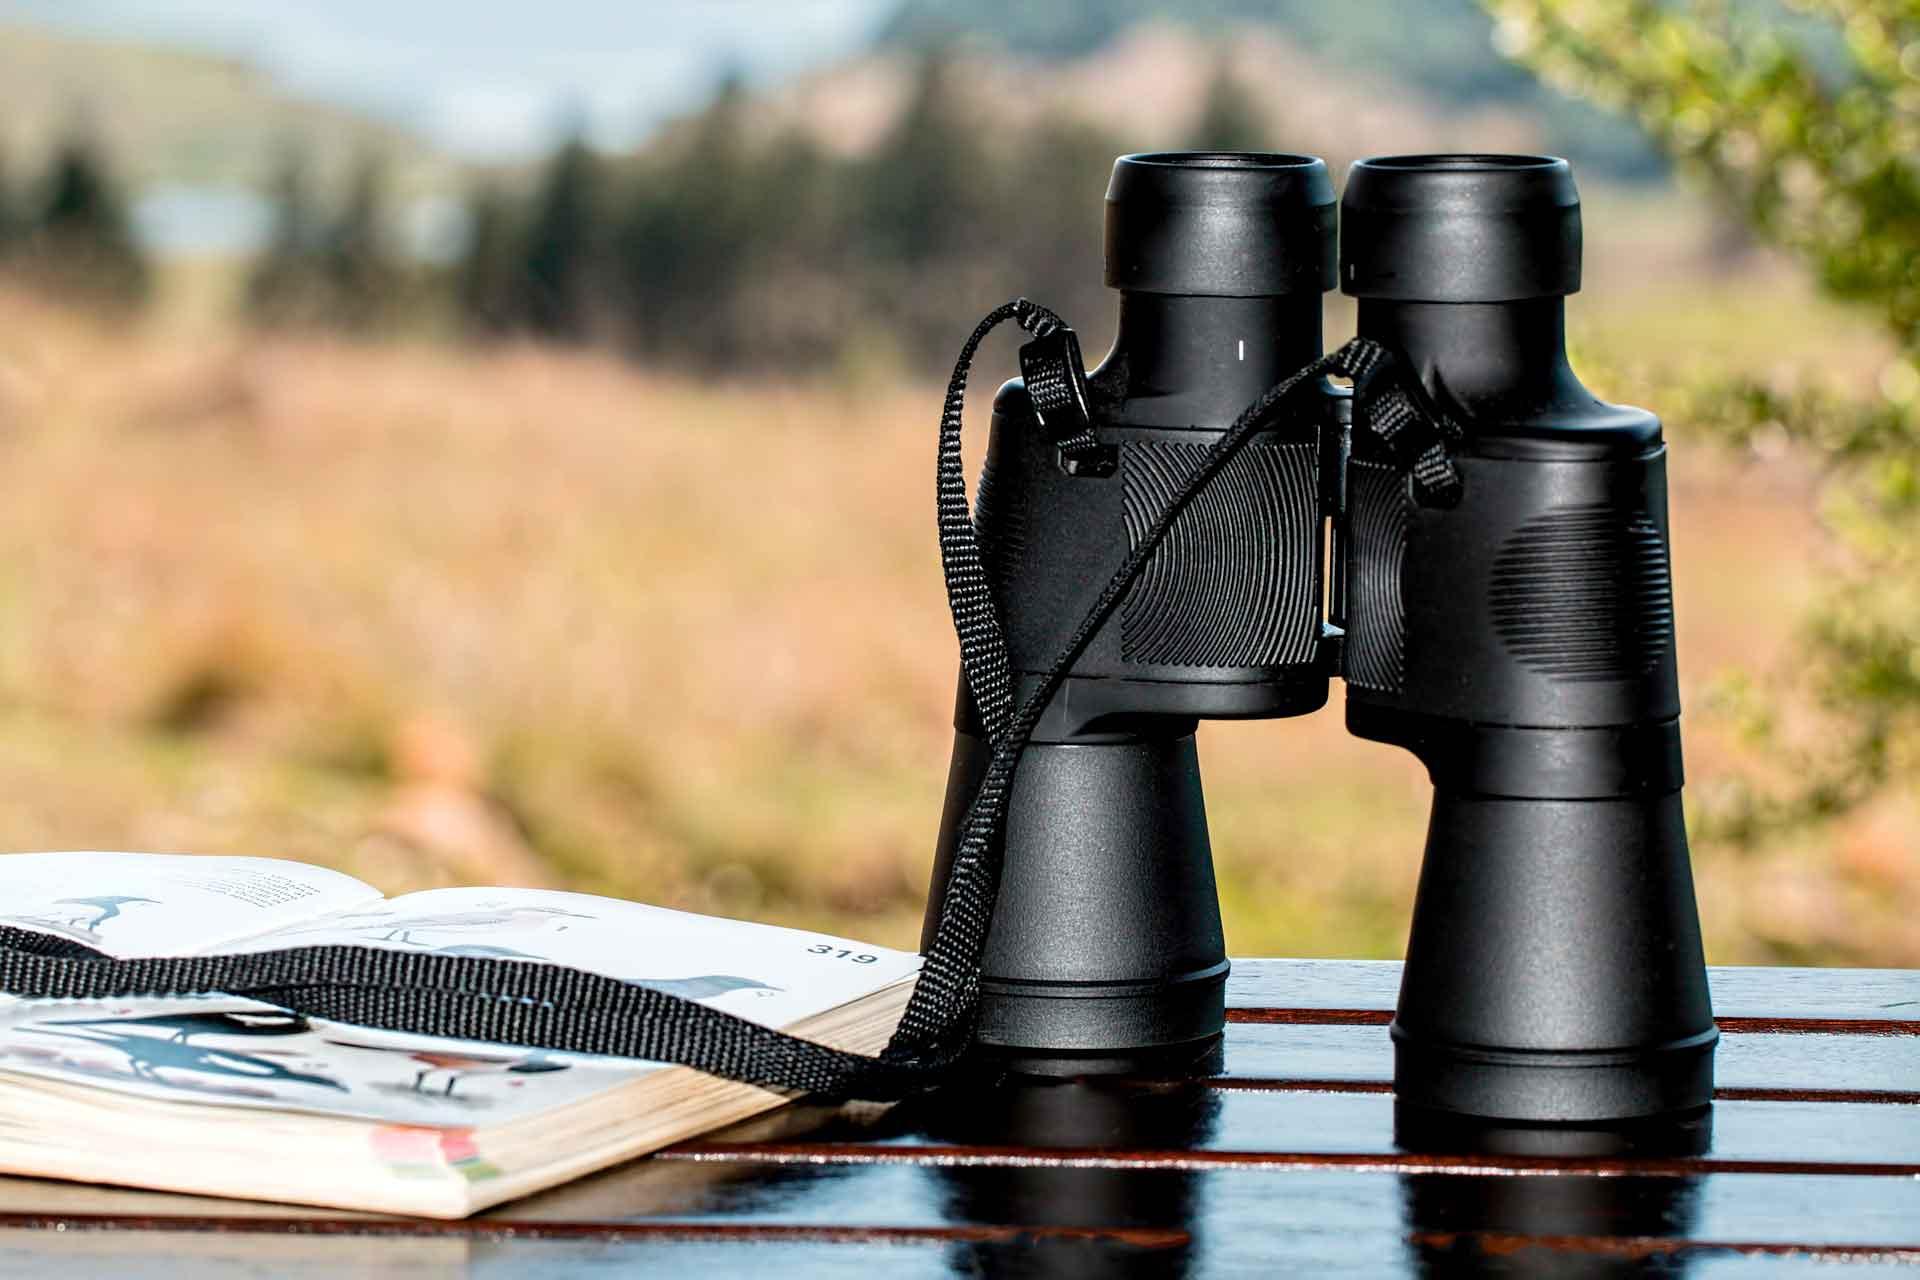 astroturismo binoculares